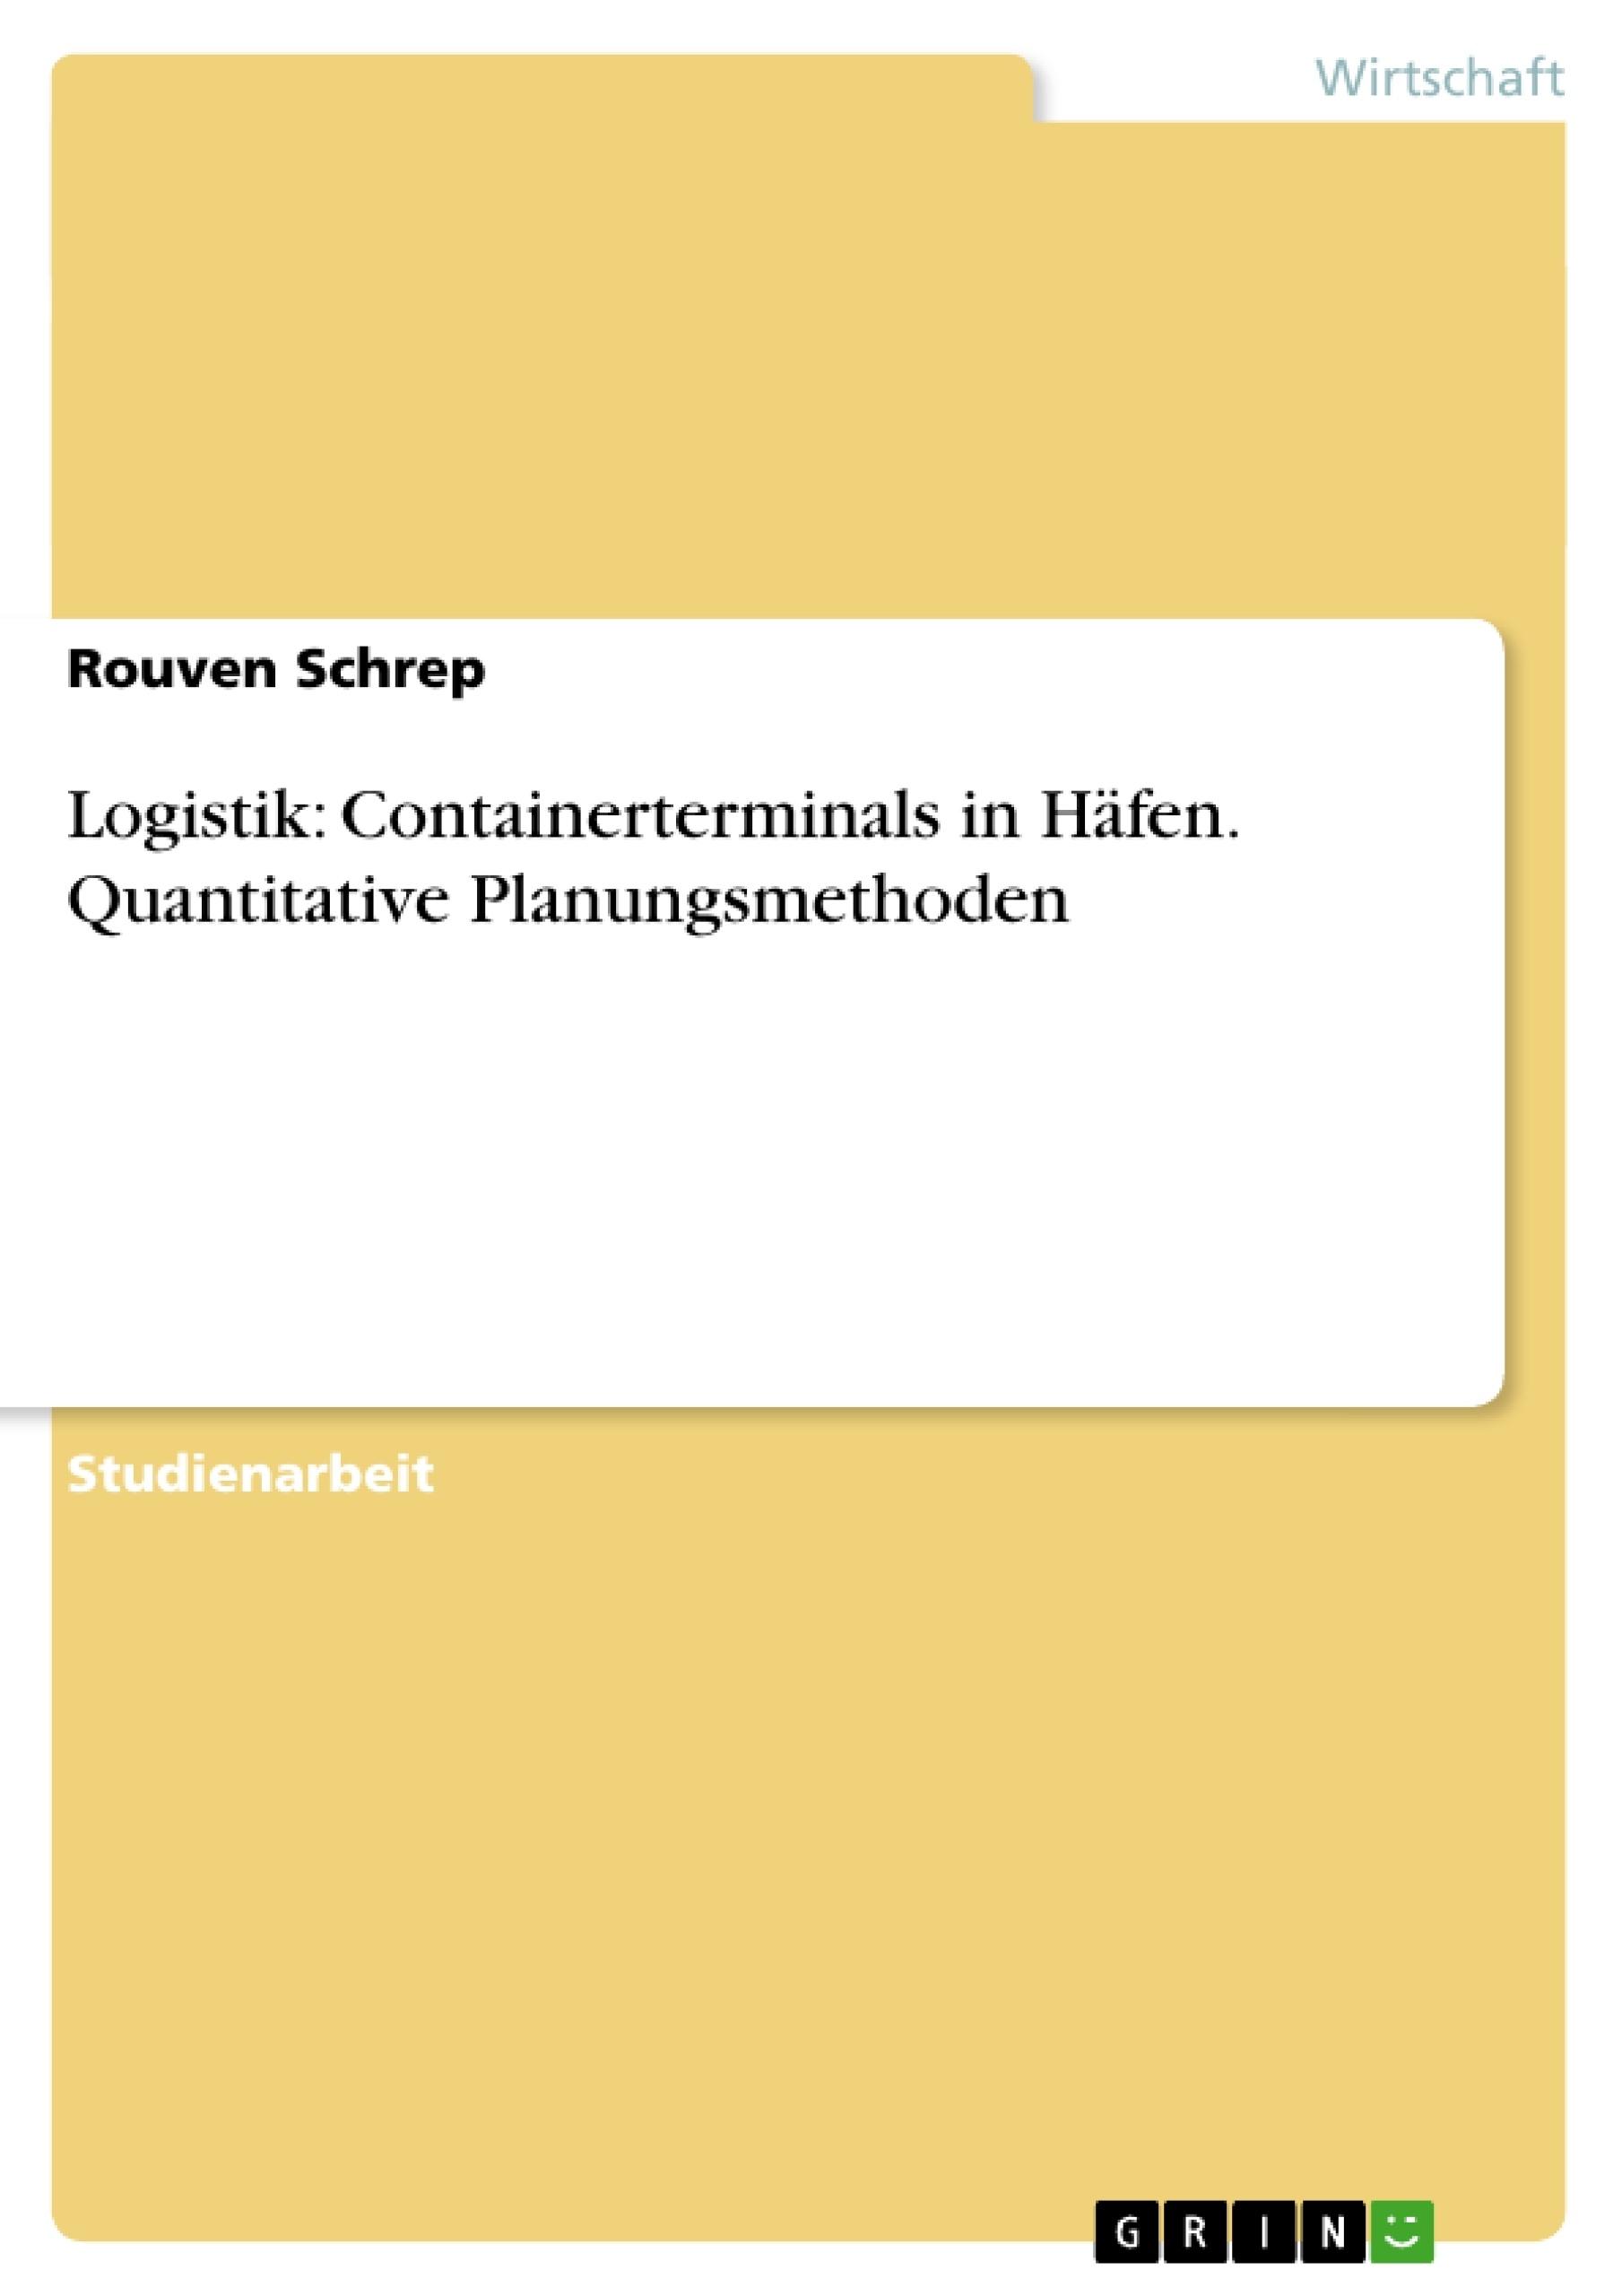 Titel: Logistik: Containerterminals in Häfen. Quantitative Planungsmethoden